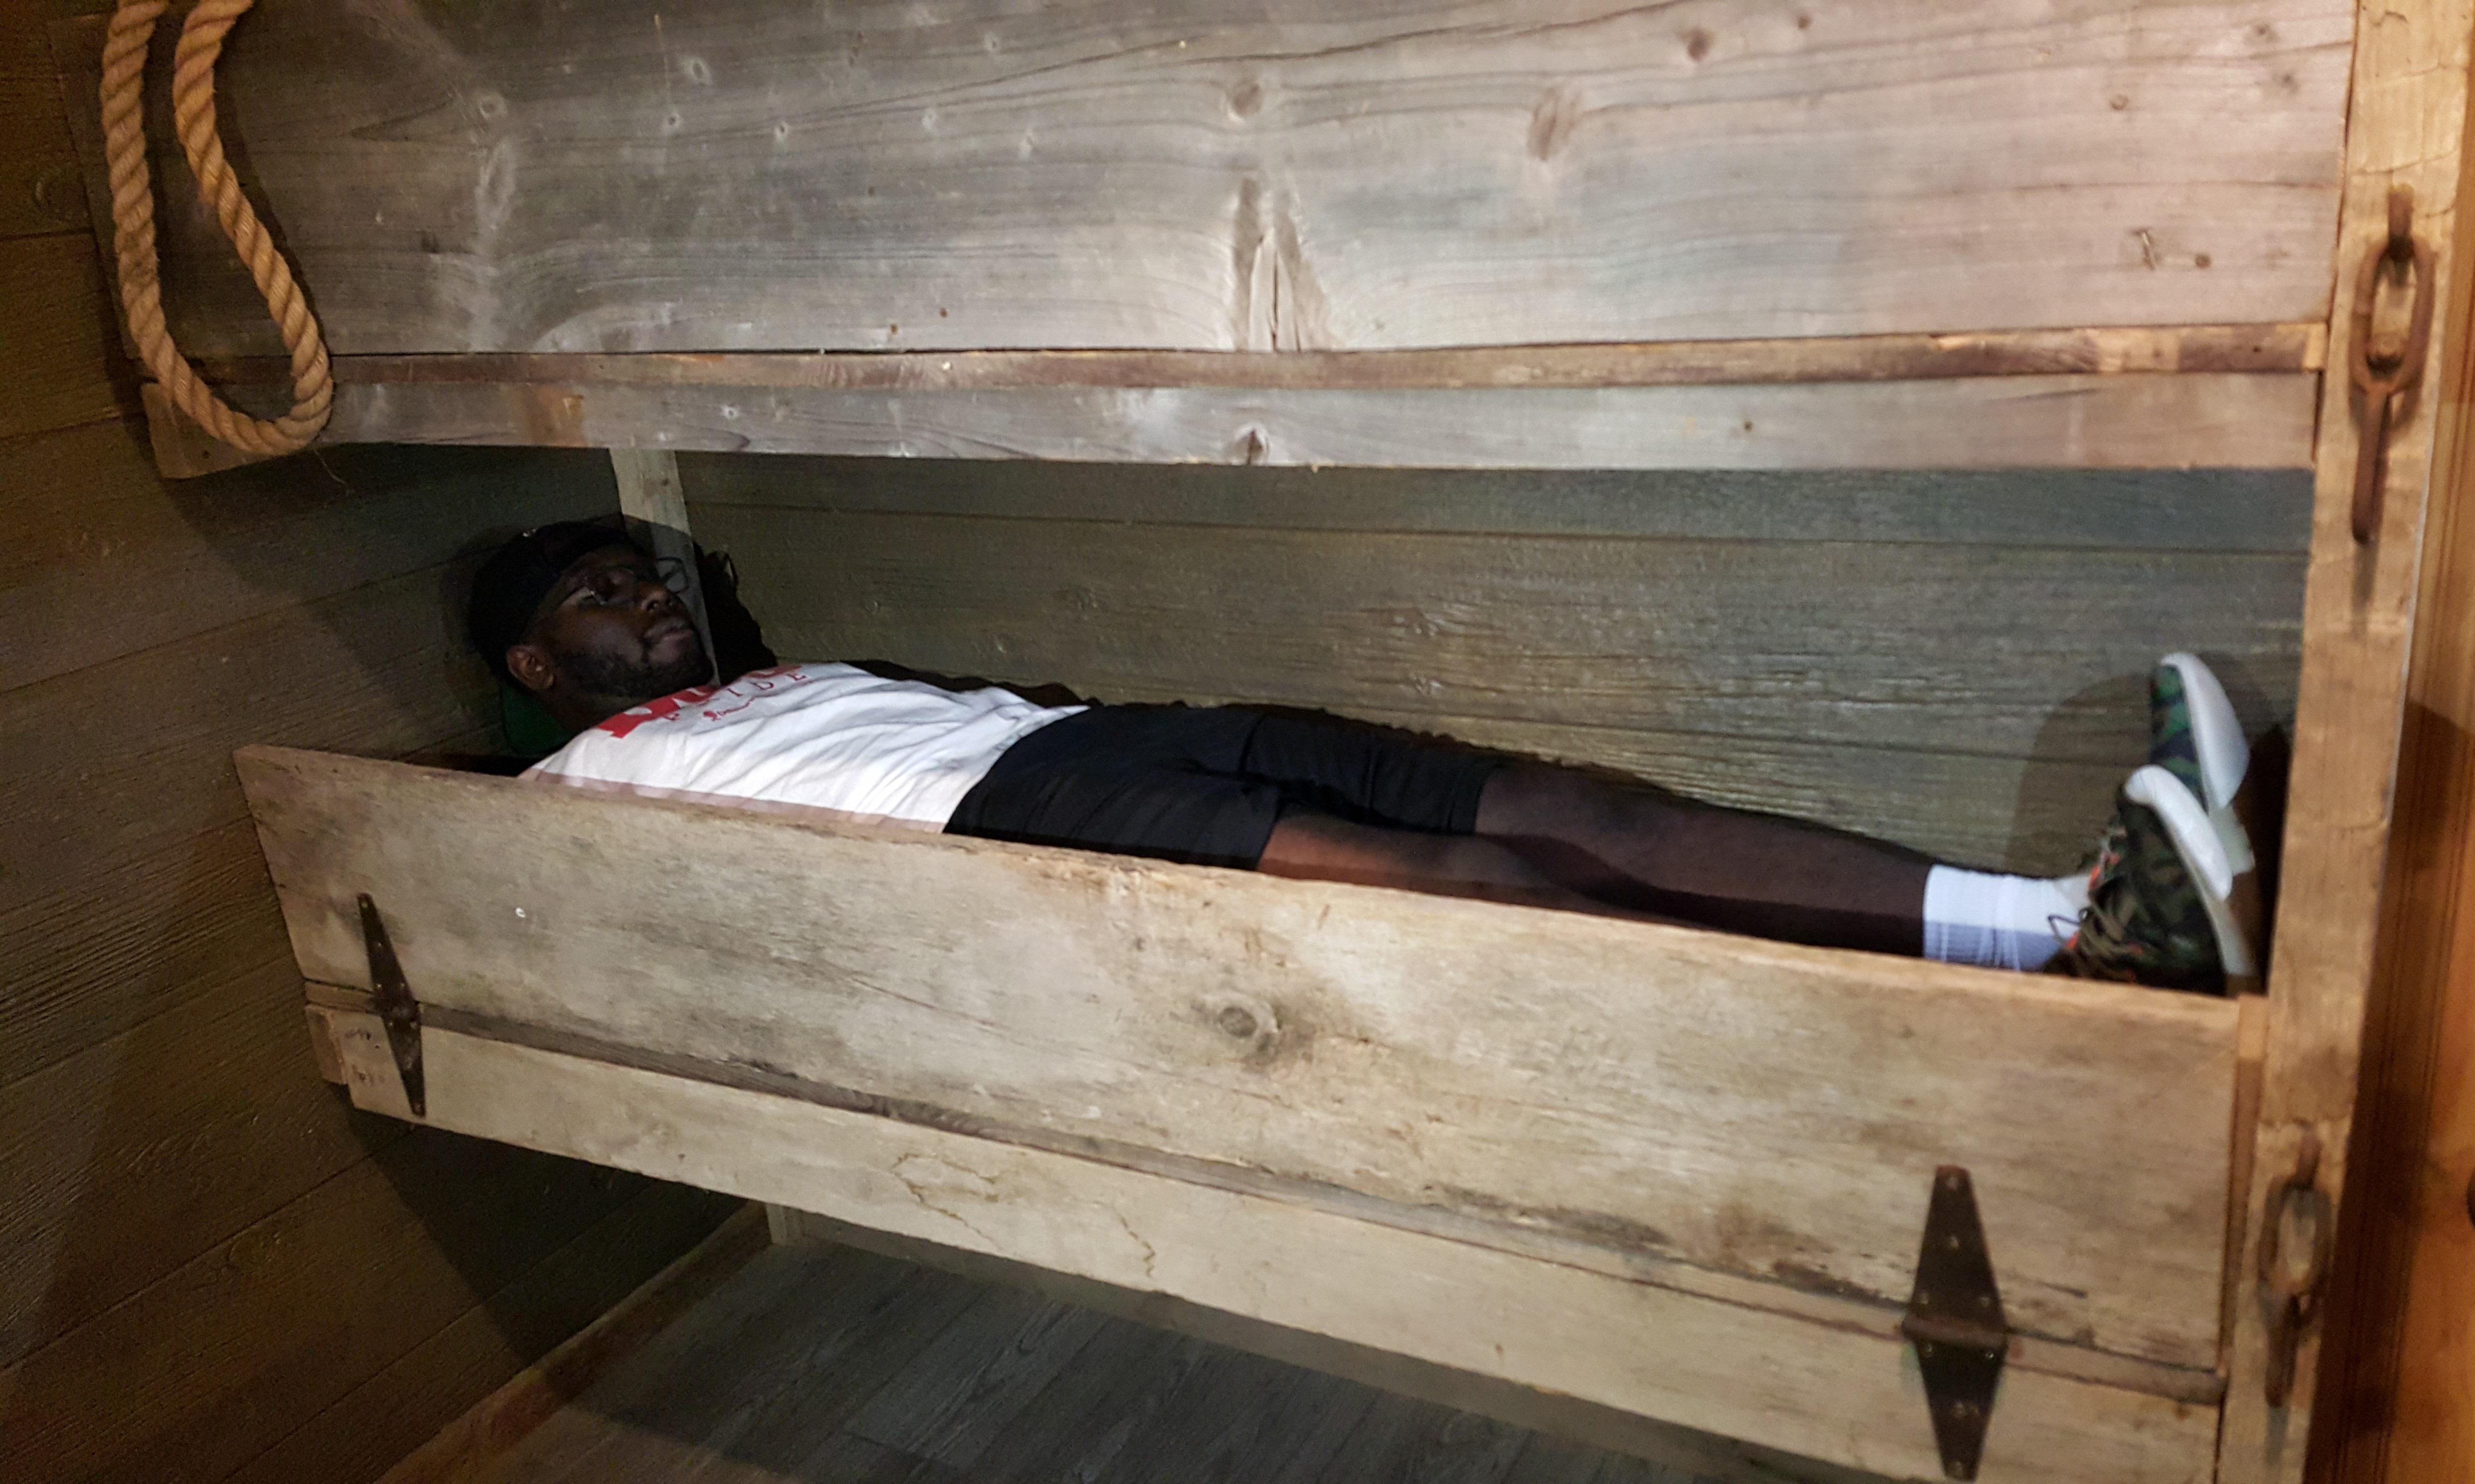 Life Aboard a slave ship